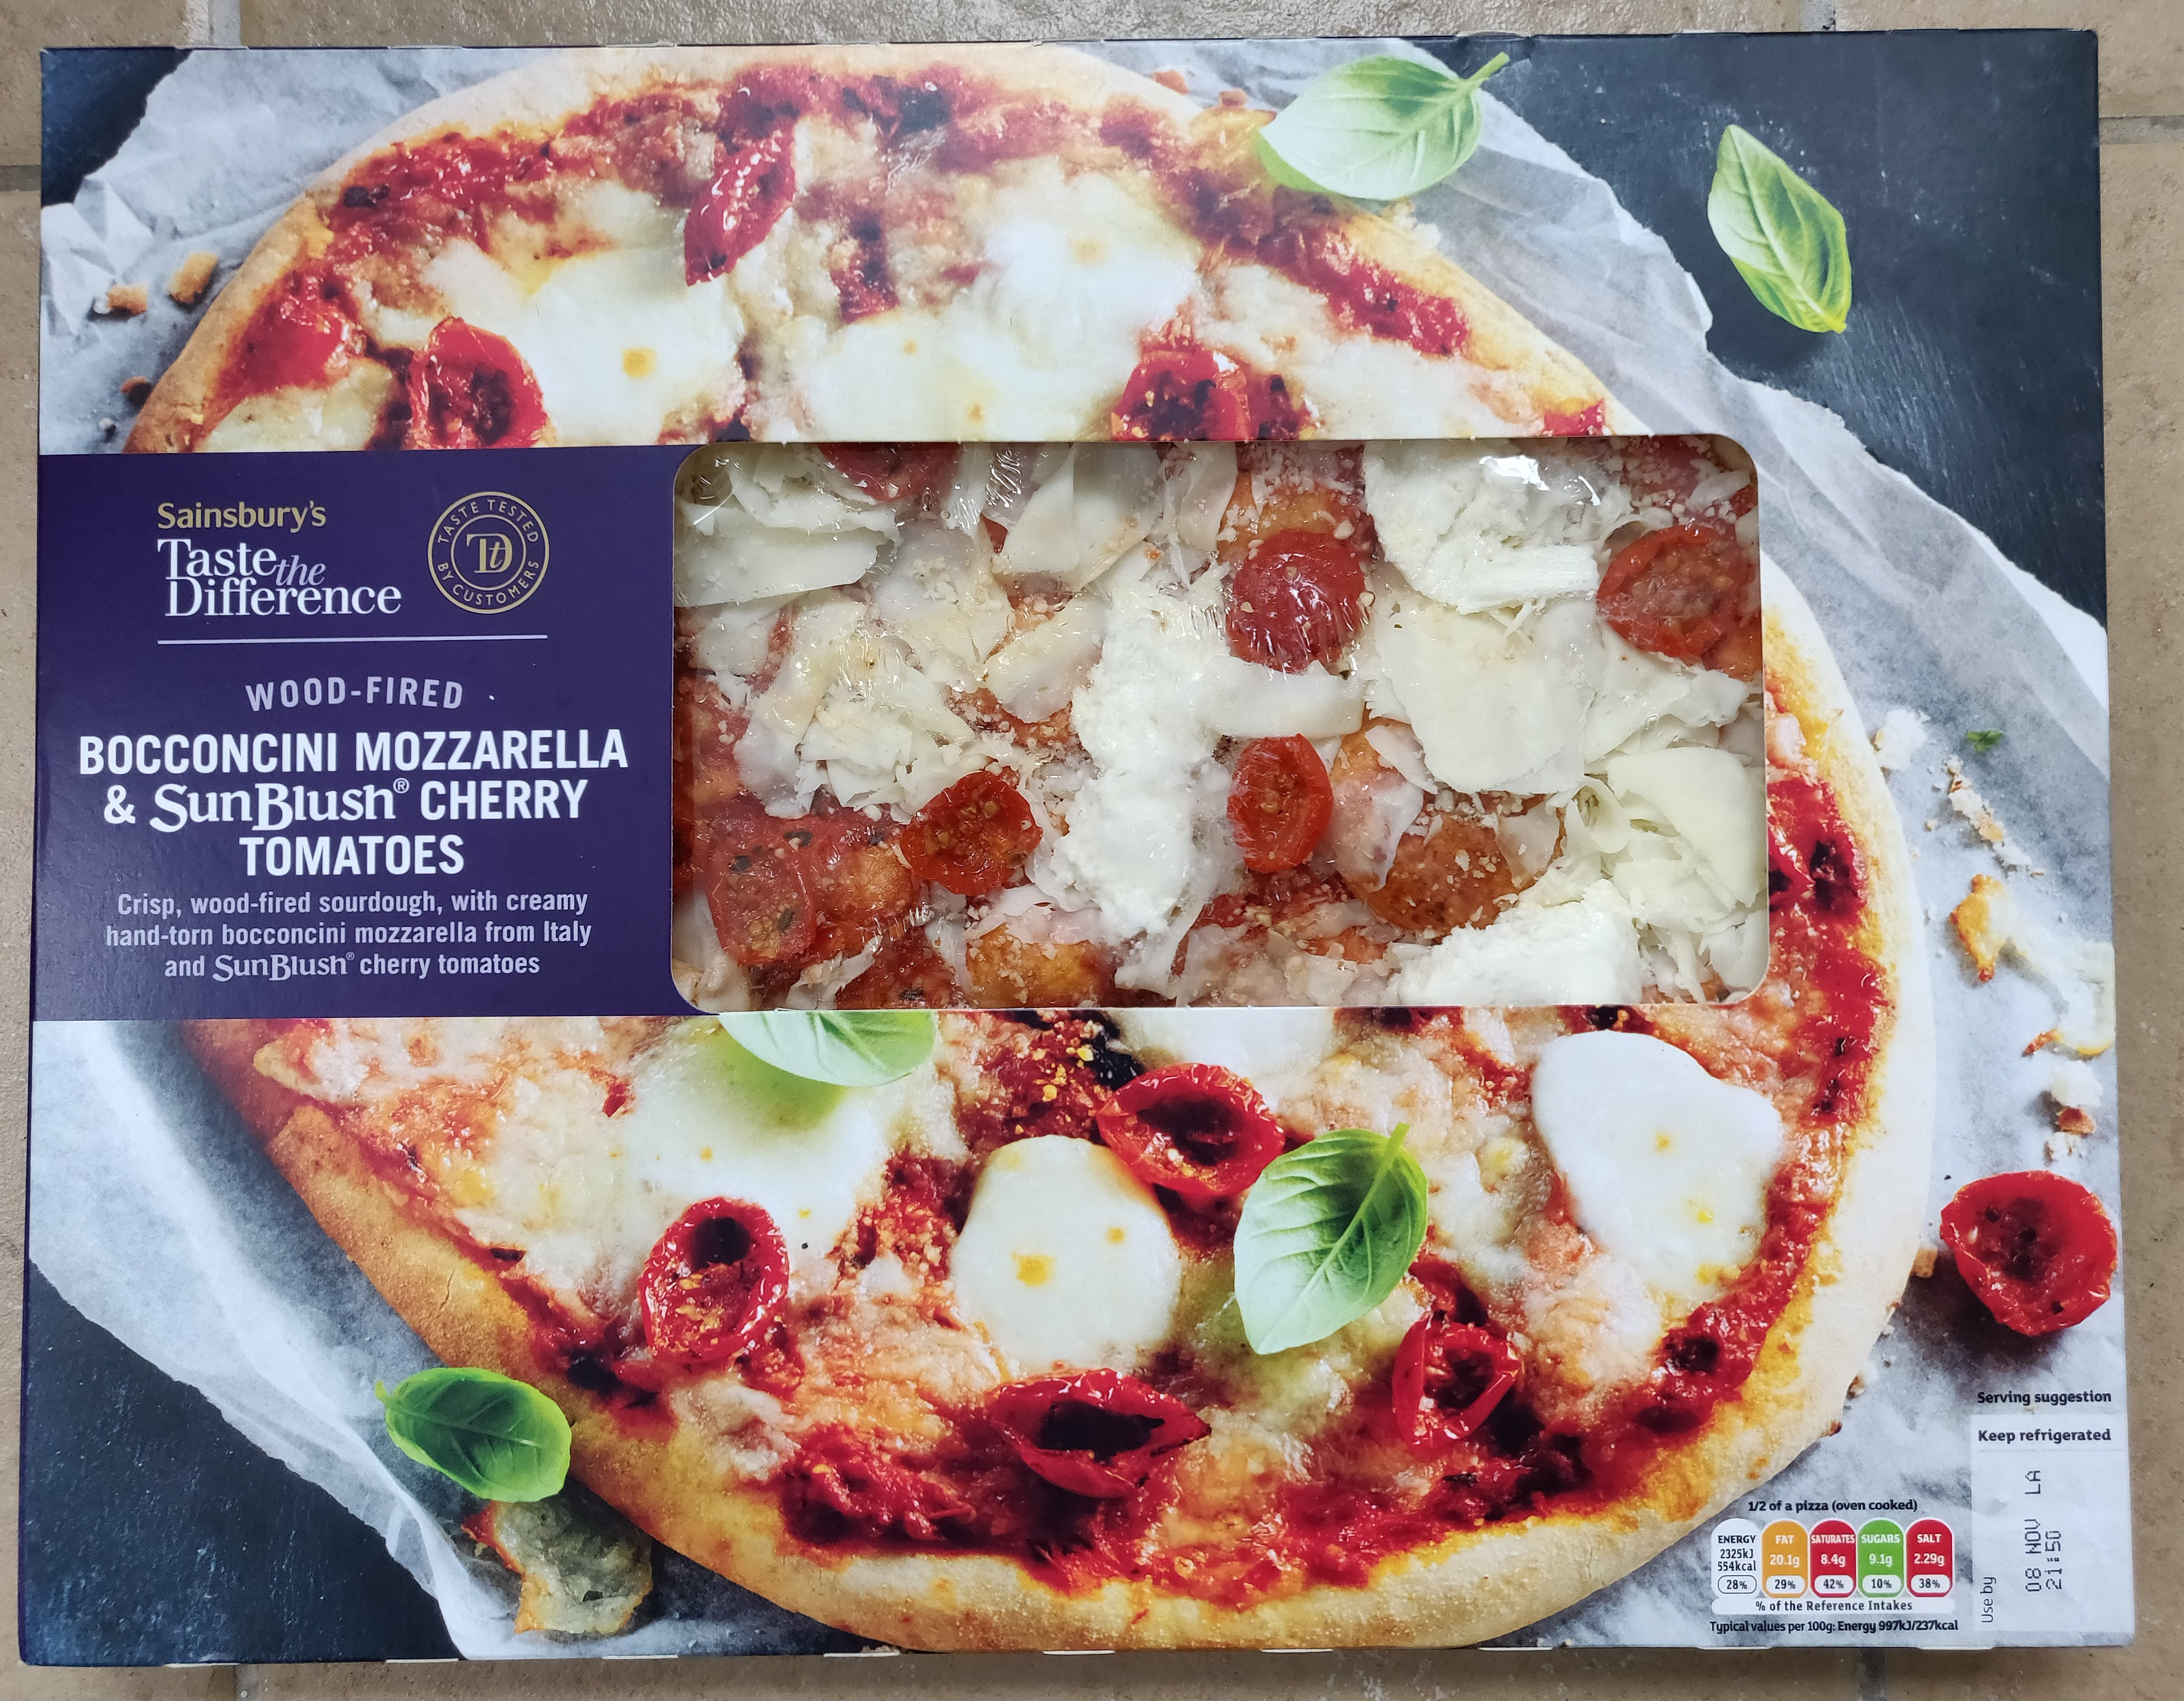 Bocconcini mozzarella & Sunblush cherry tomatoes - Product - en